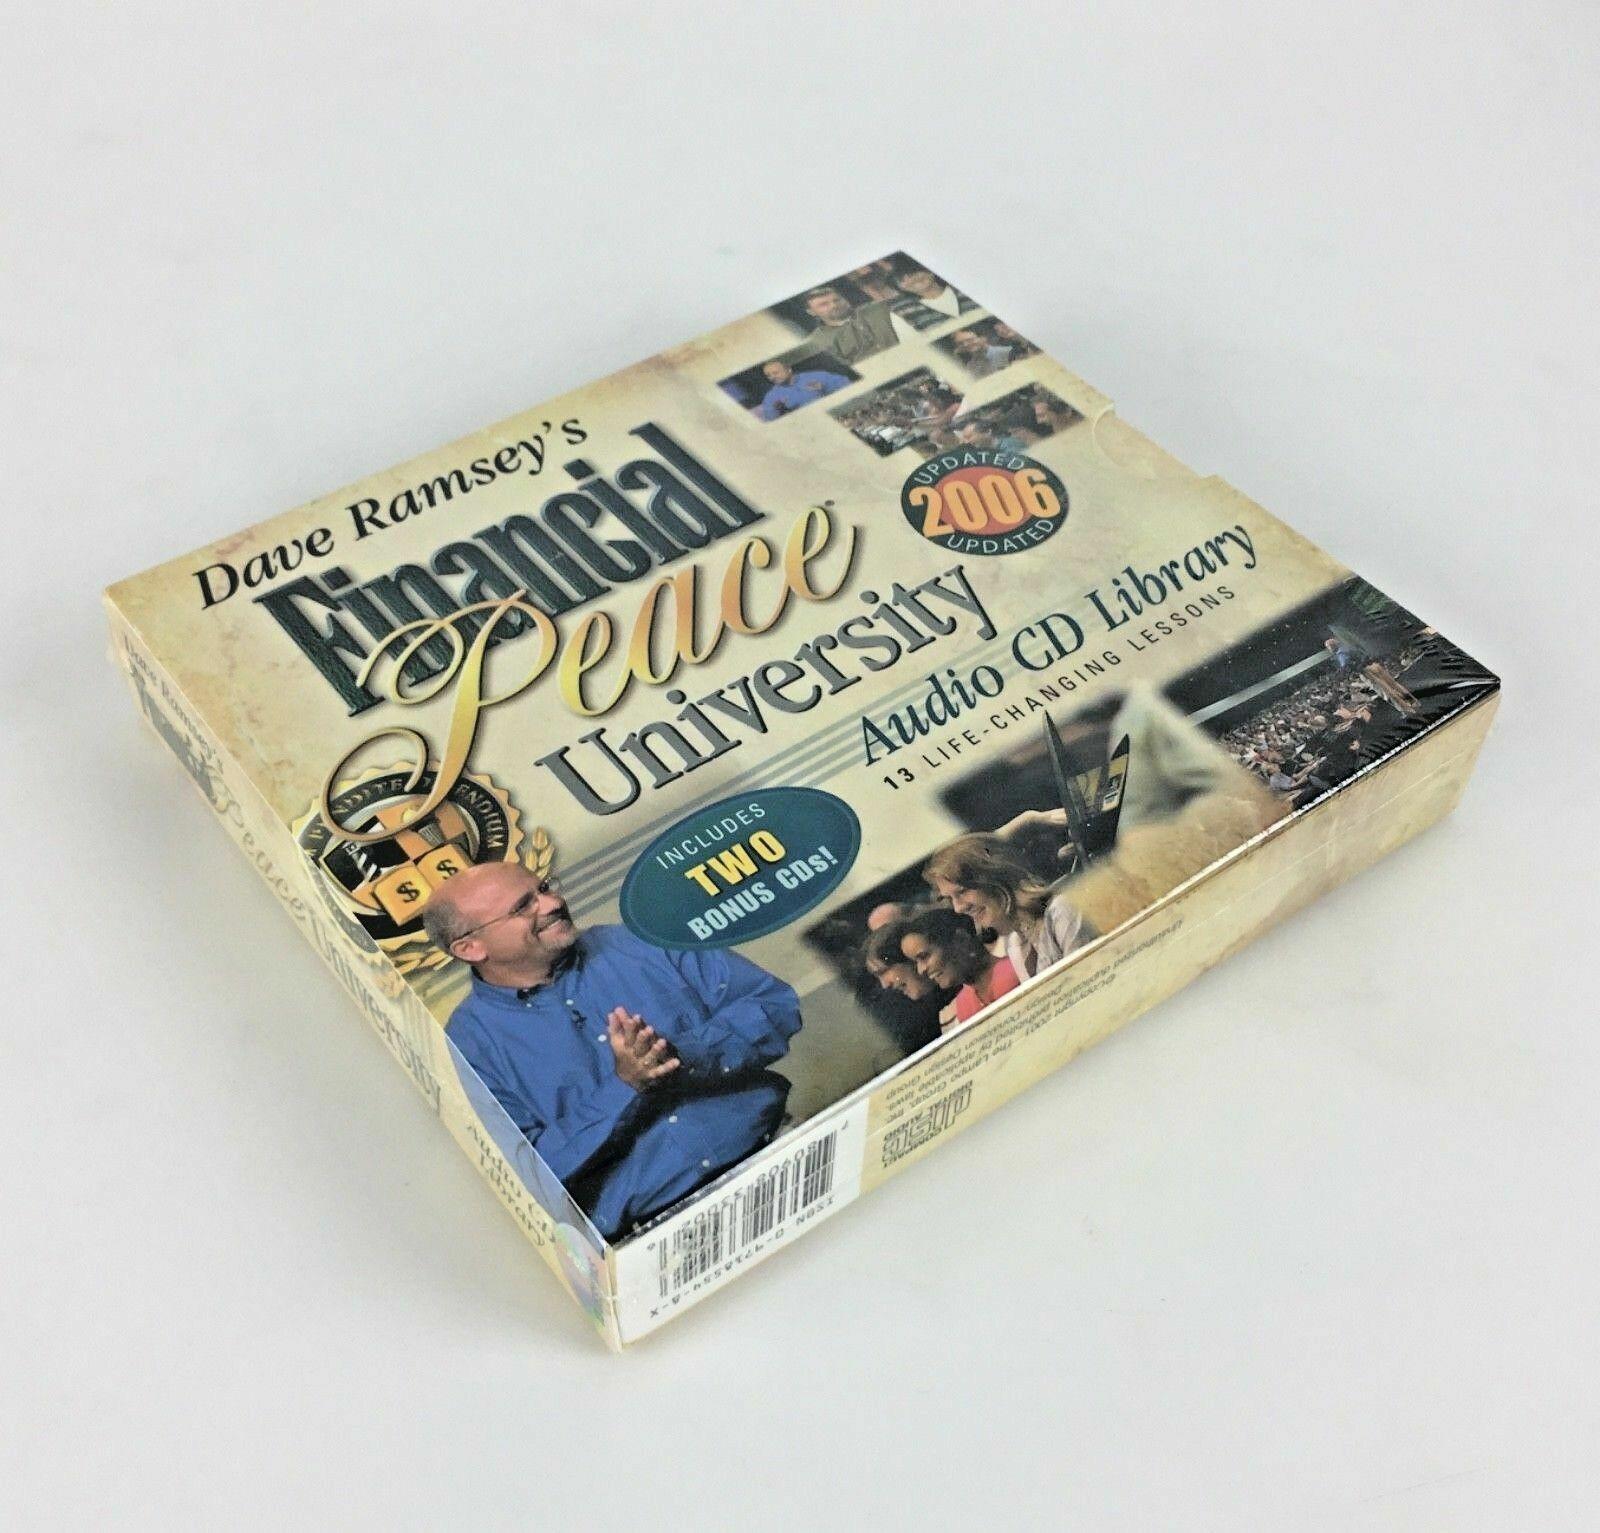 New Dave Ramsey s Financial Peace Audio CD Library Bonus Beat Debt Build Wealth - $24.45